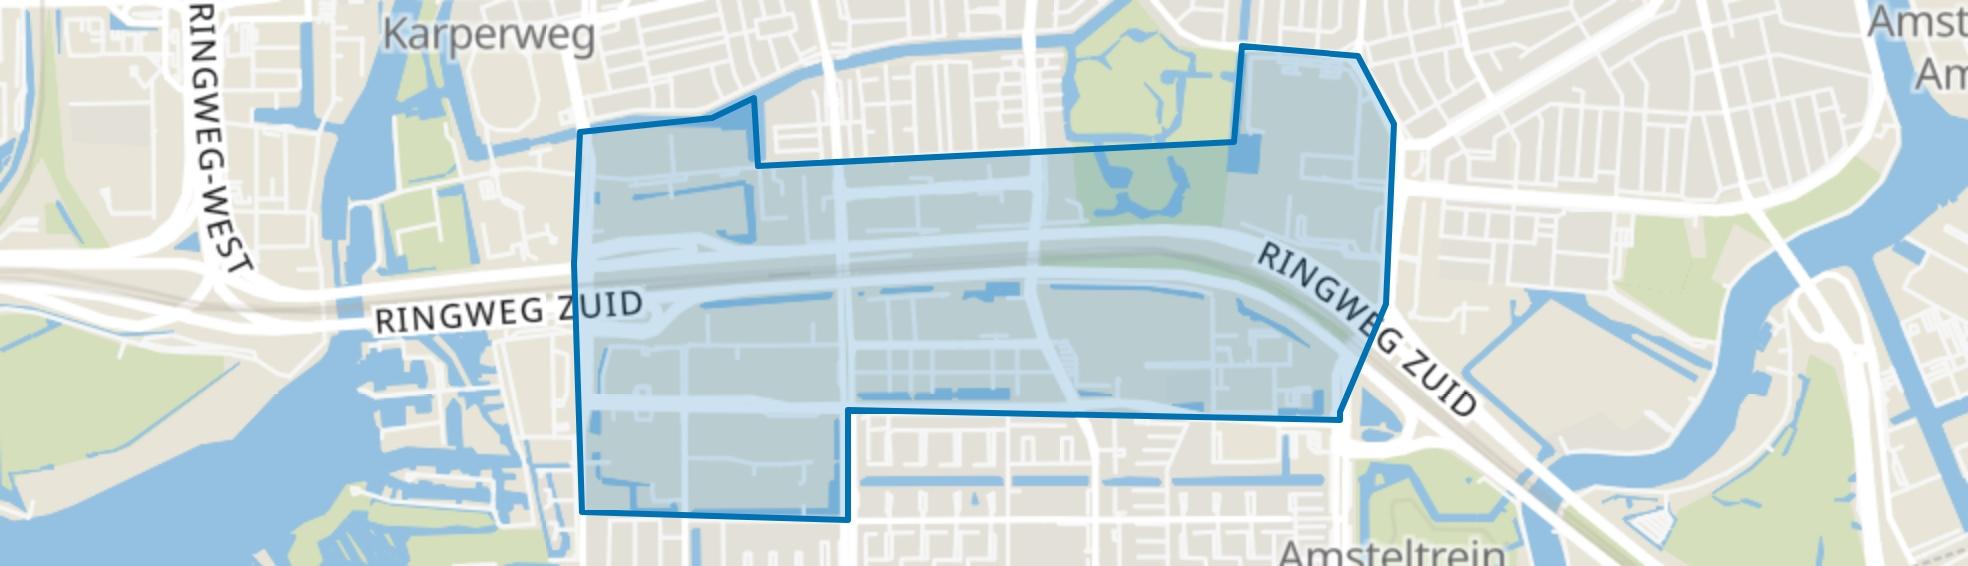 Zuidas, Amsterdam map